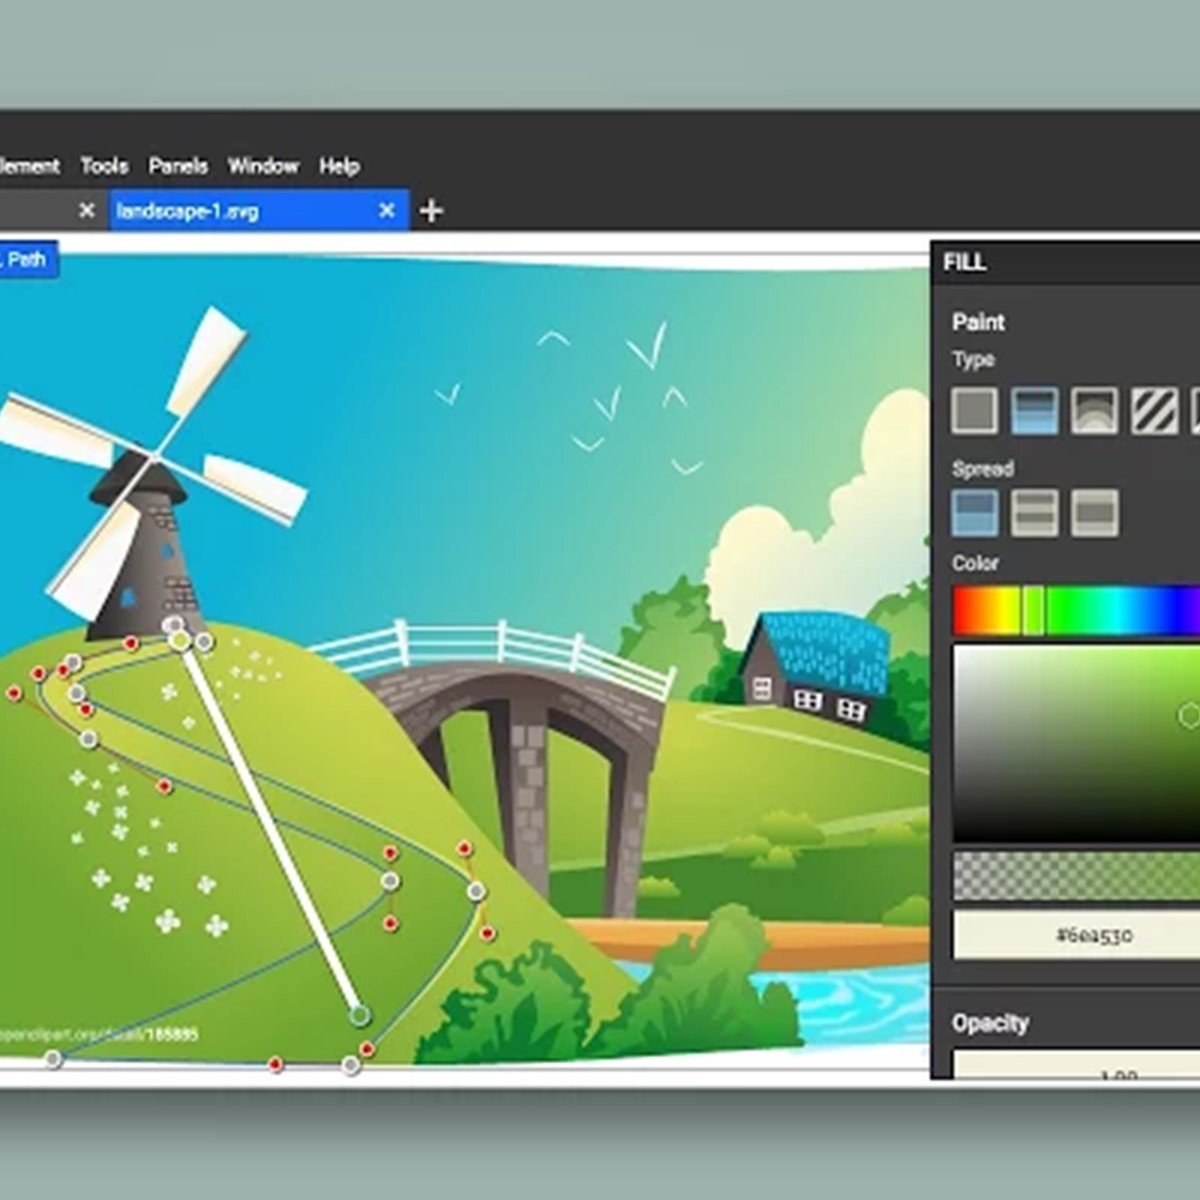 Boxy Svg Alternatives And Similar Software Alternativeto Net